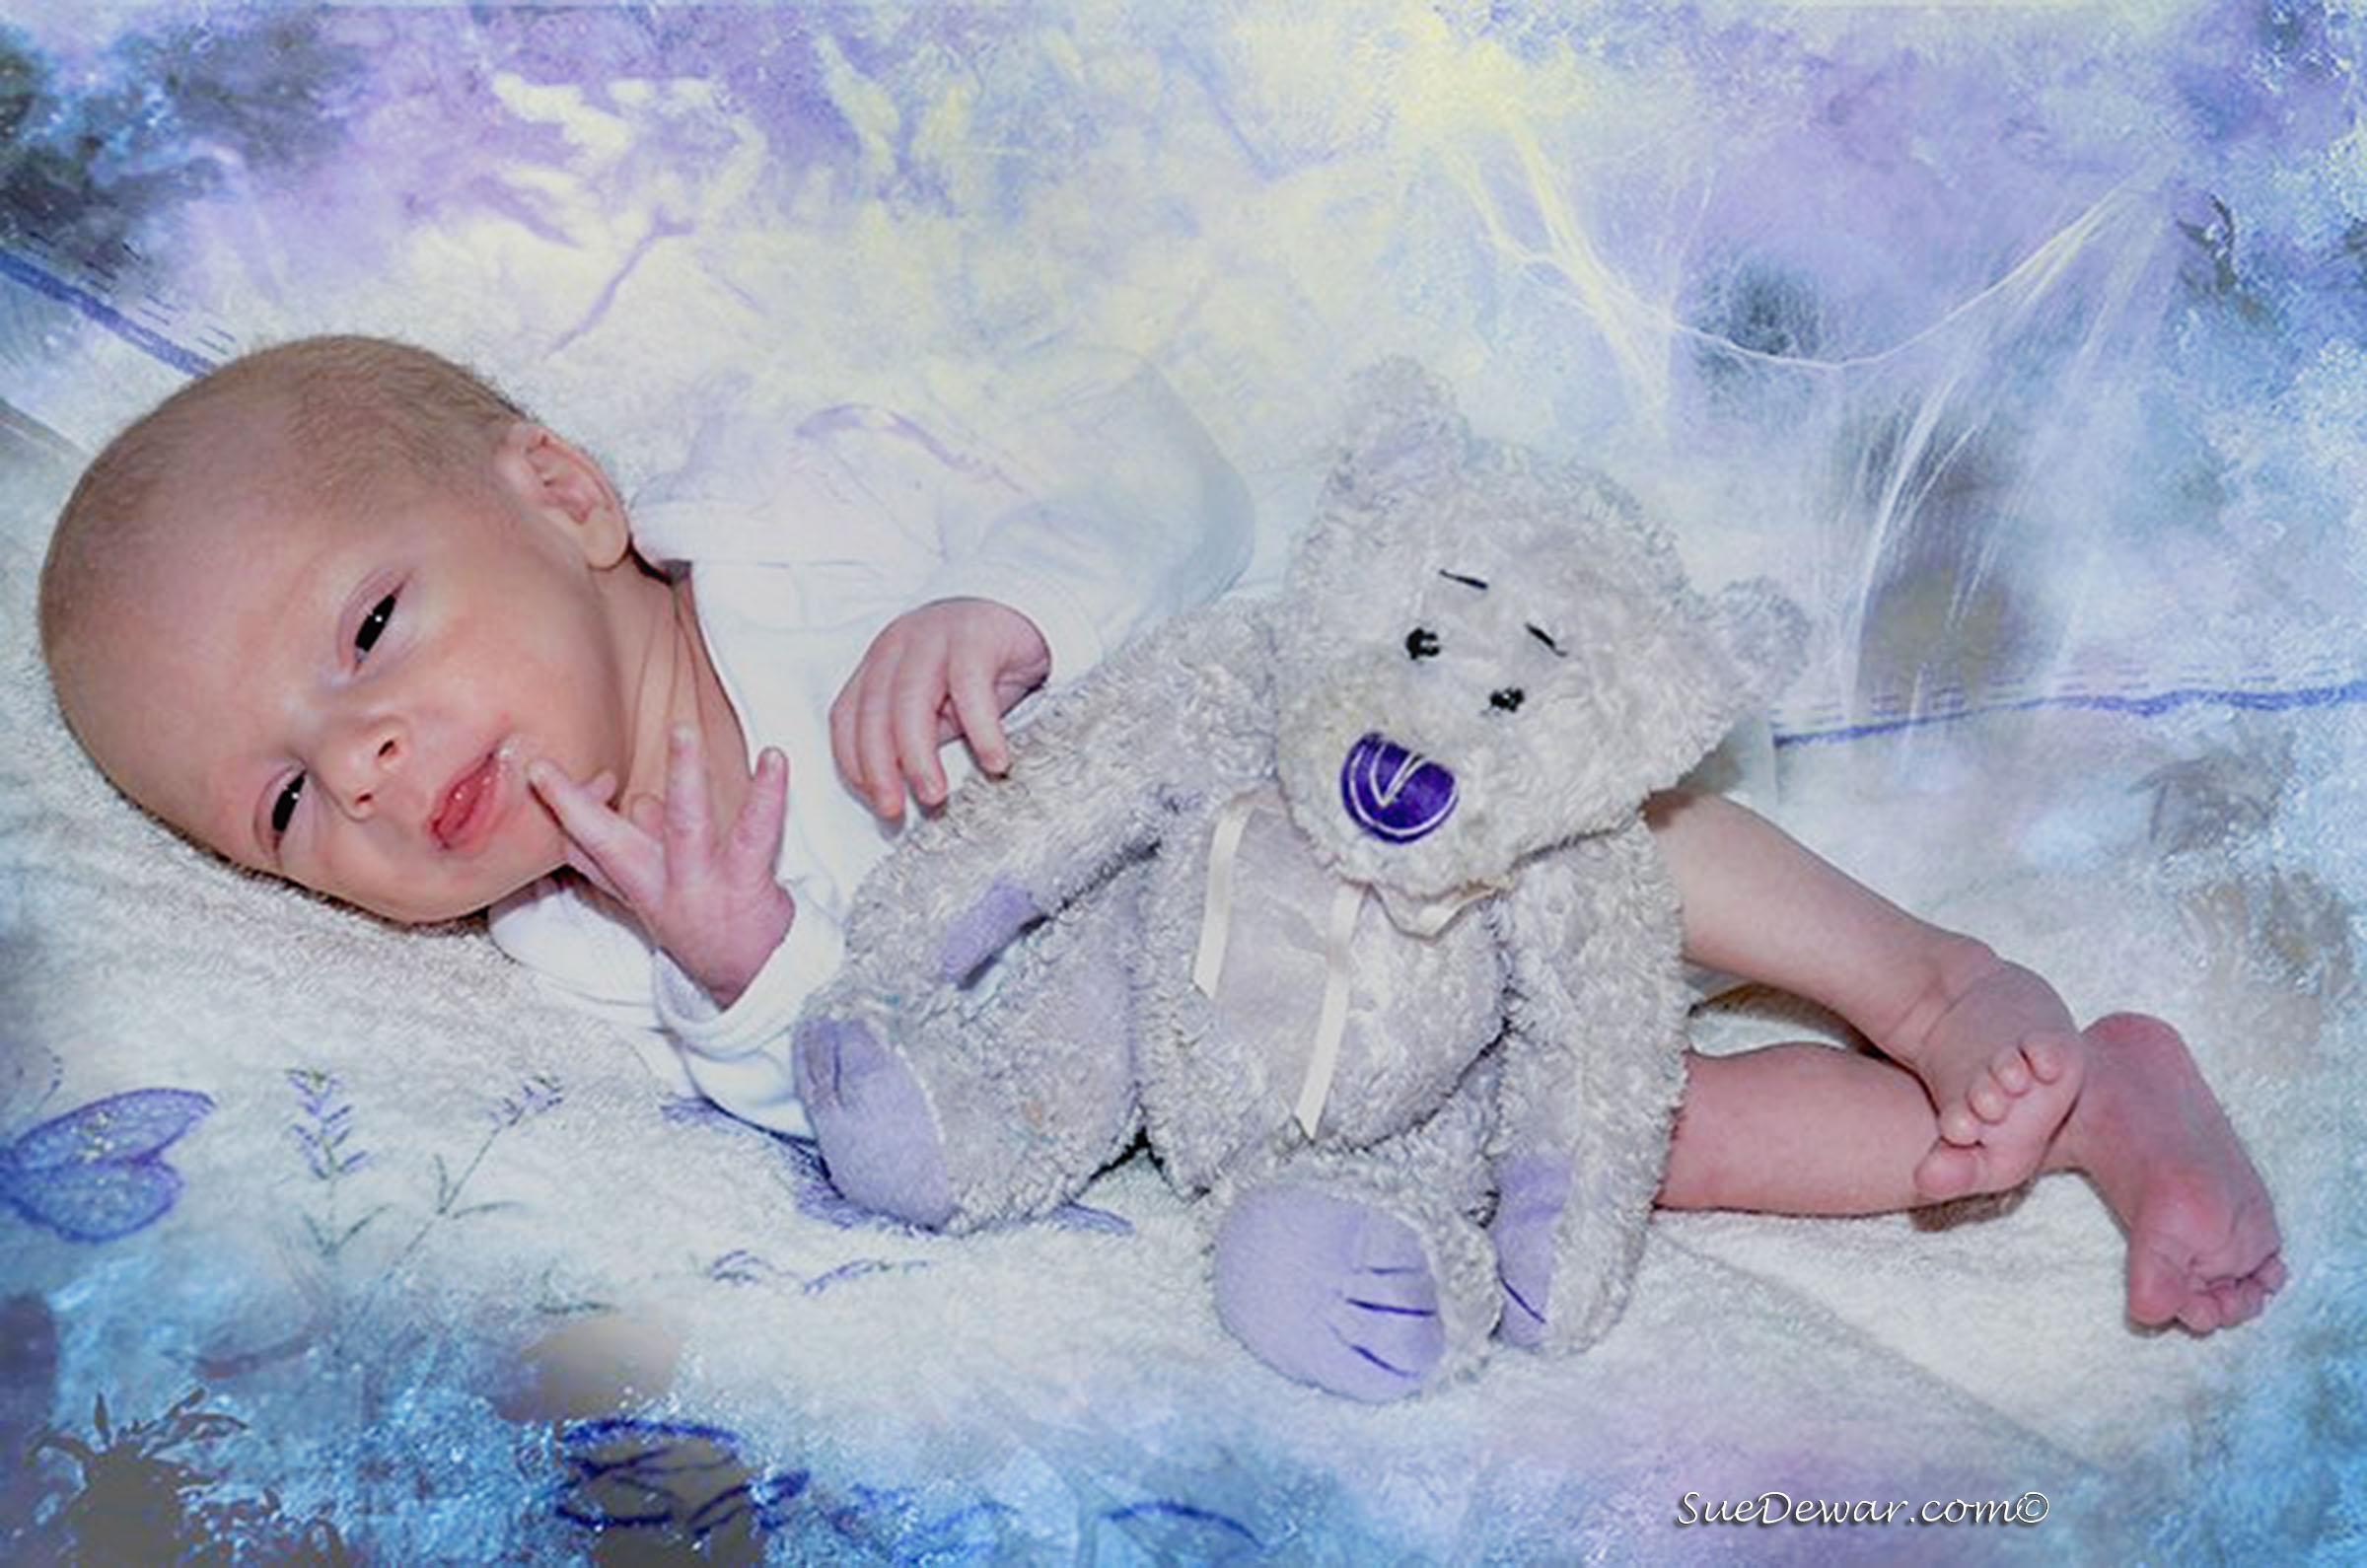 SueDewar_Family_Portraits_Babies